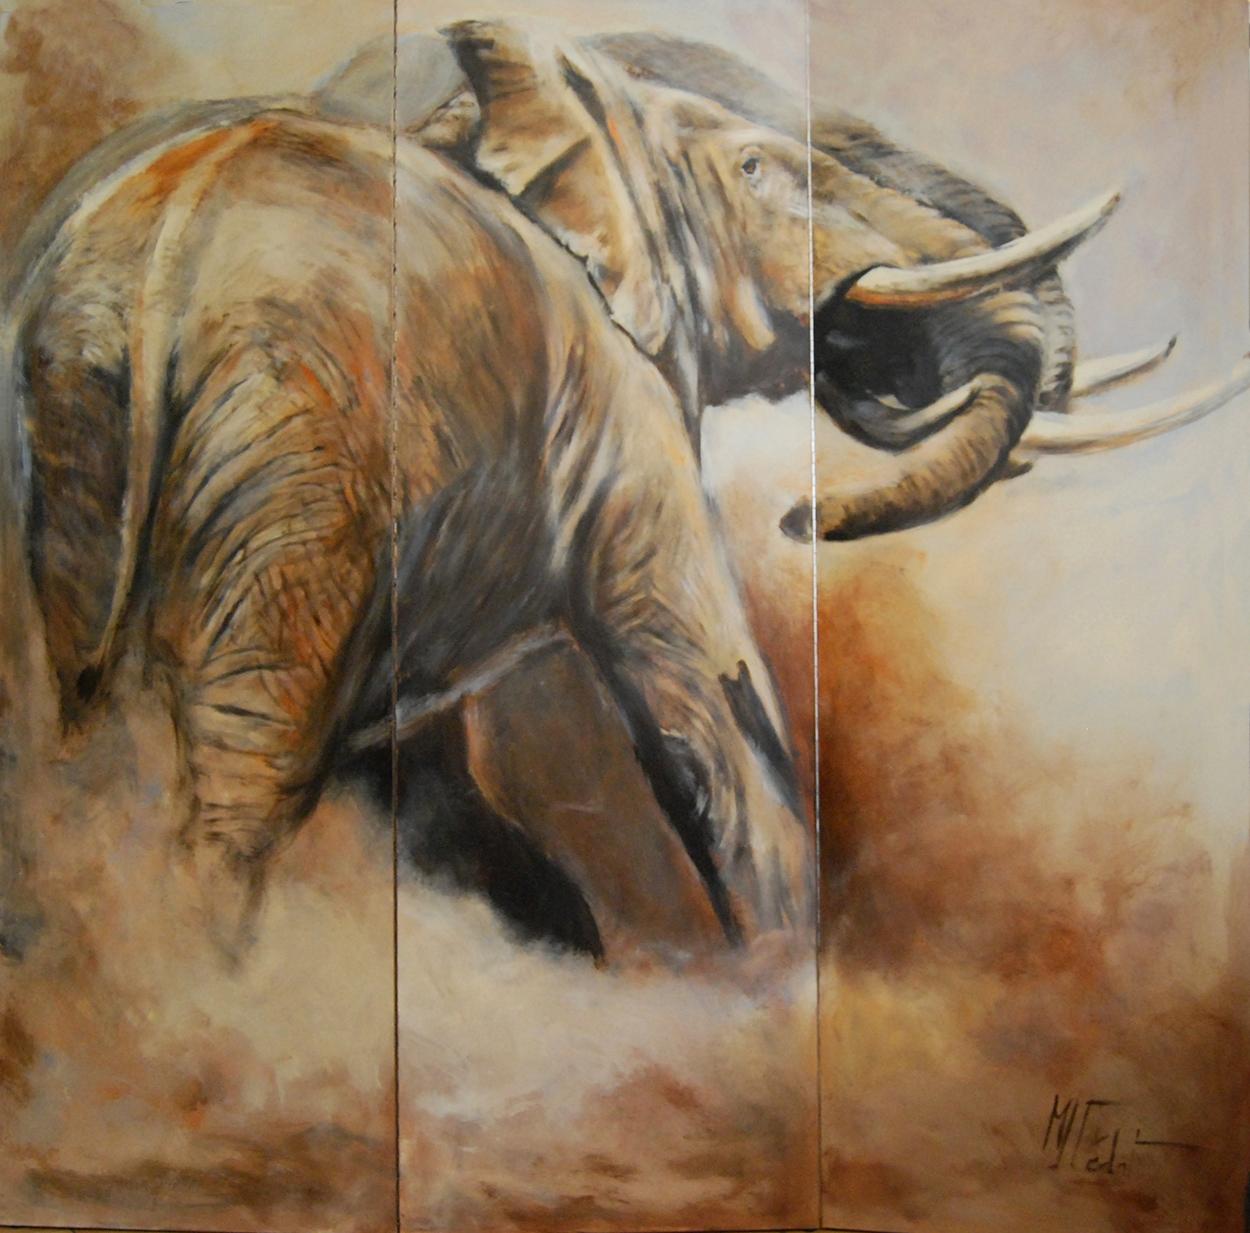 paravent 5 verso éléphant -Marie-Joëlle Cédat-artiste animalier peinture animaliere-art-animalier- peintre-animalier